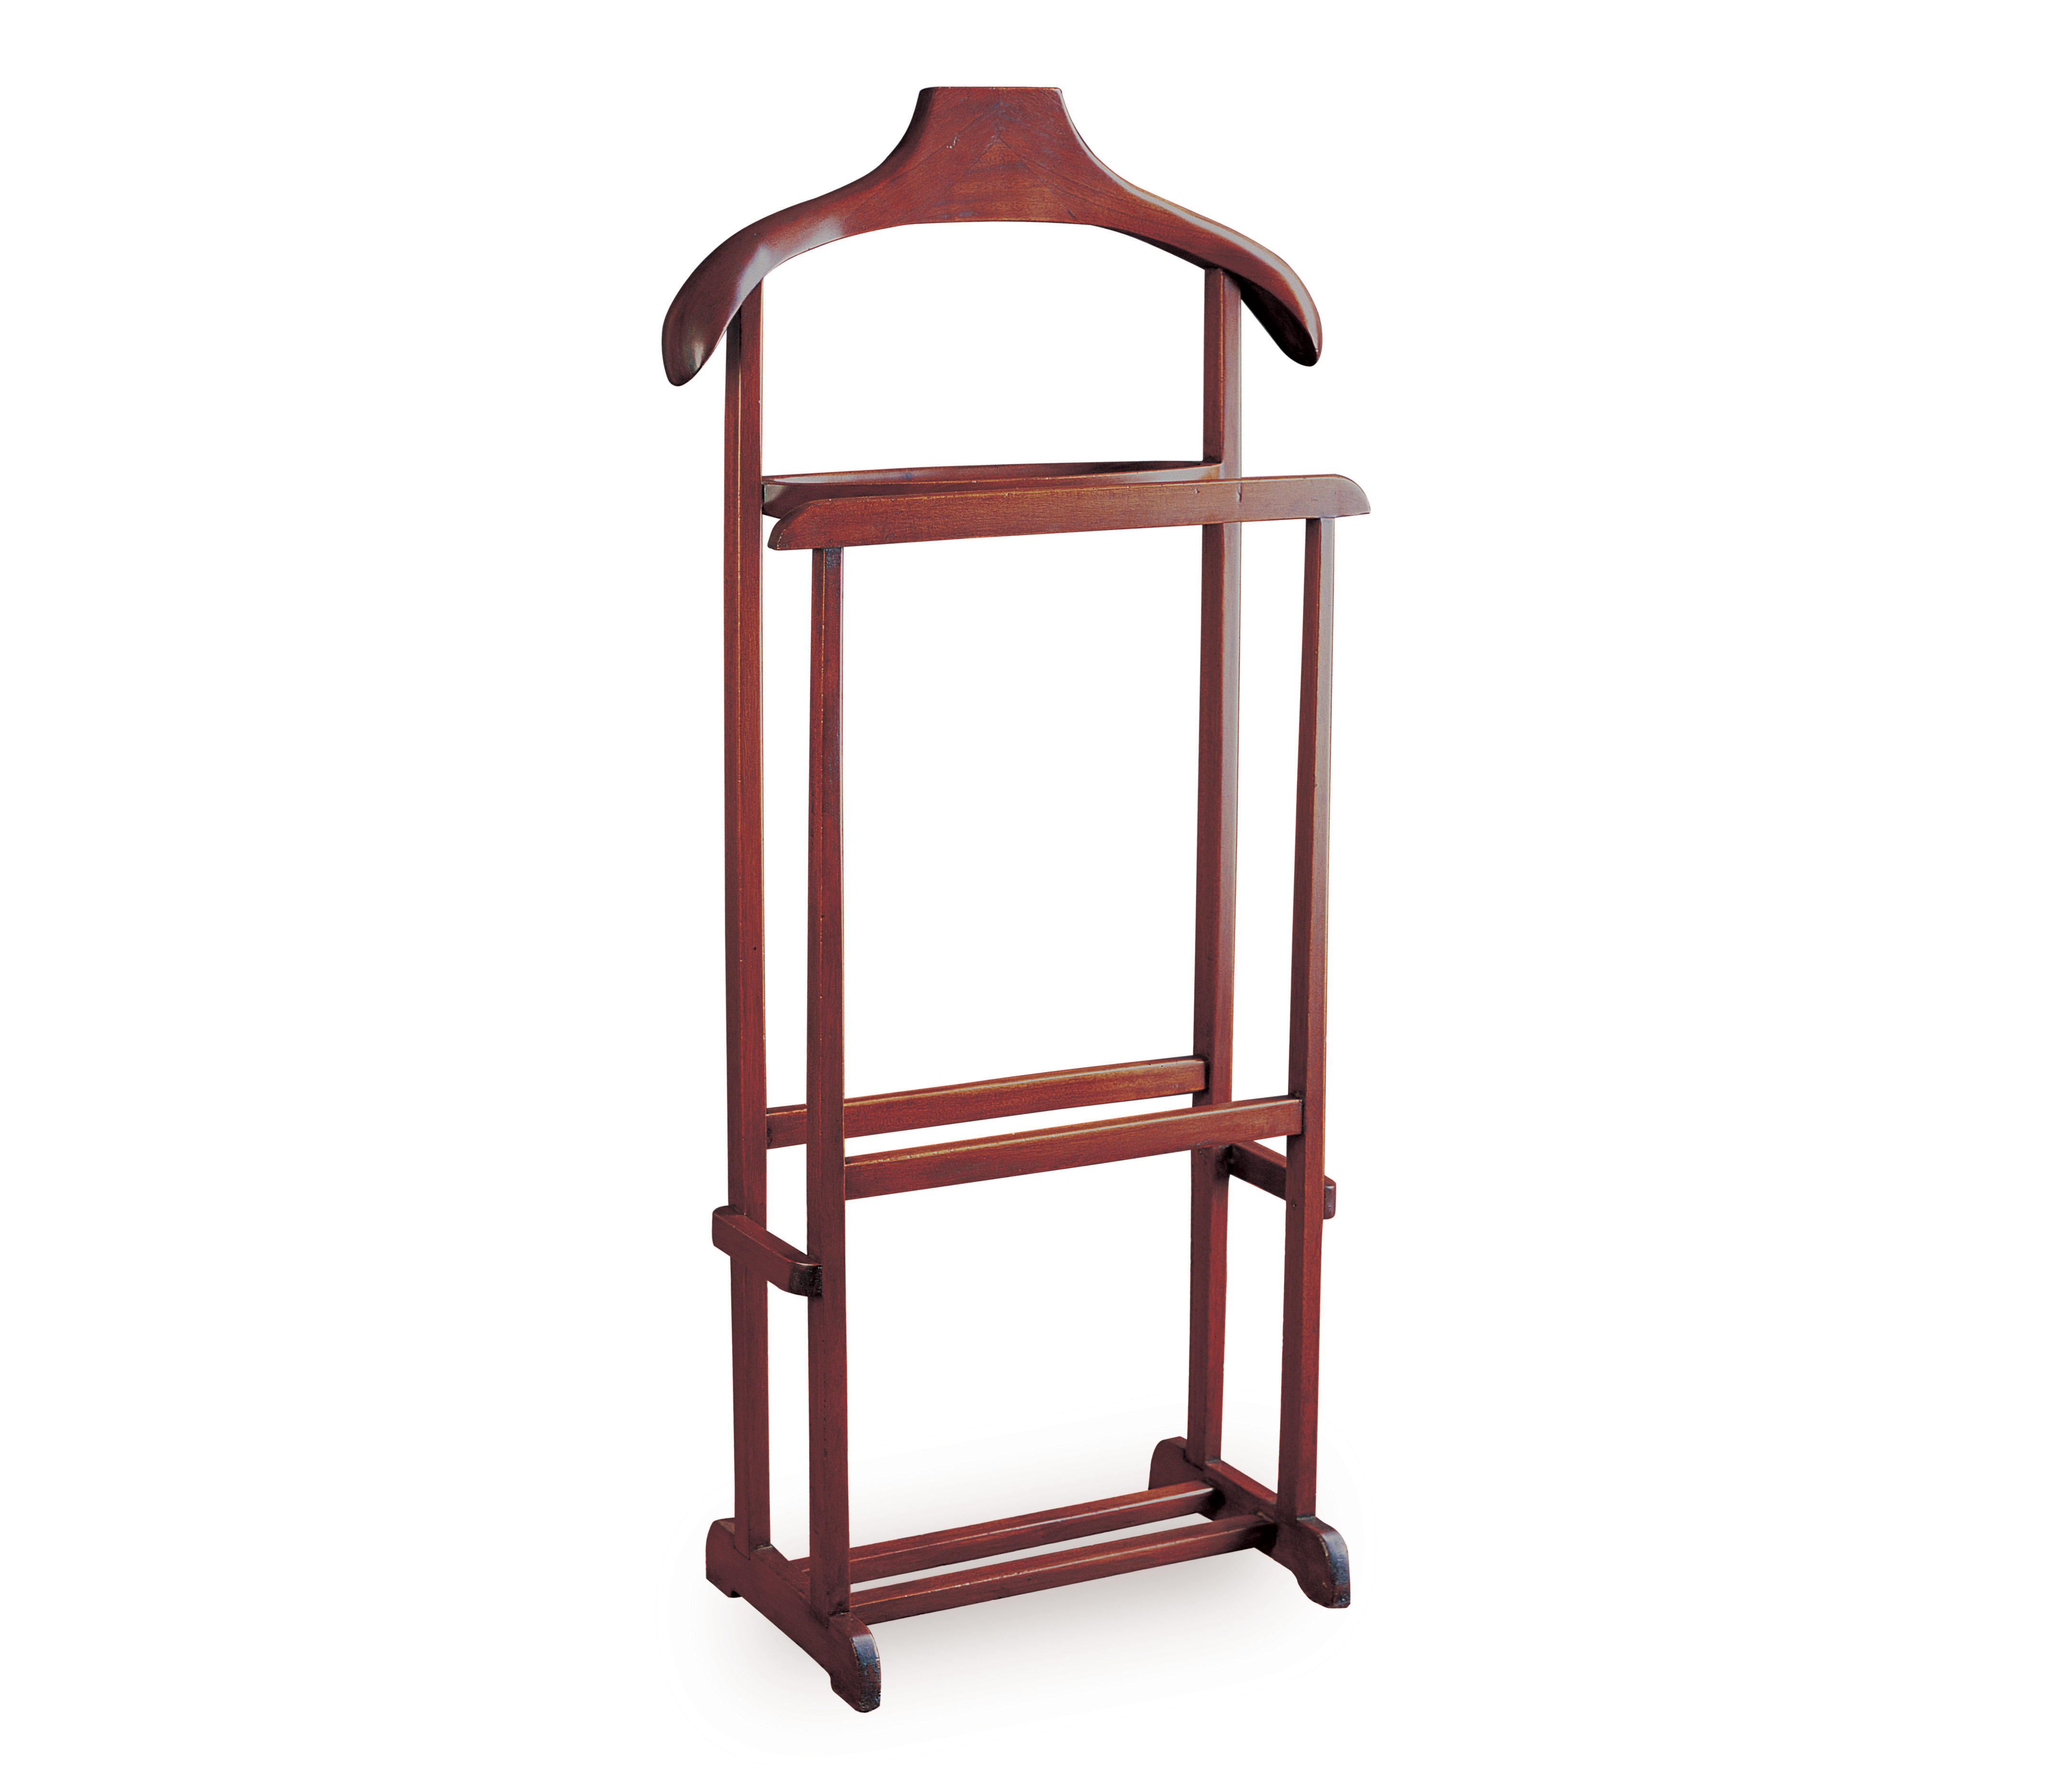 Muebles barakaldo affordable armario m muy buena calidad for Muebles marian